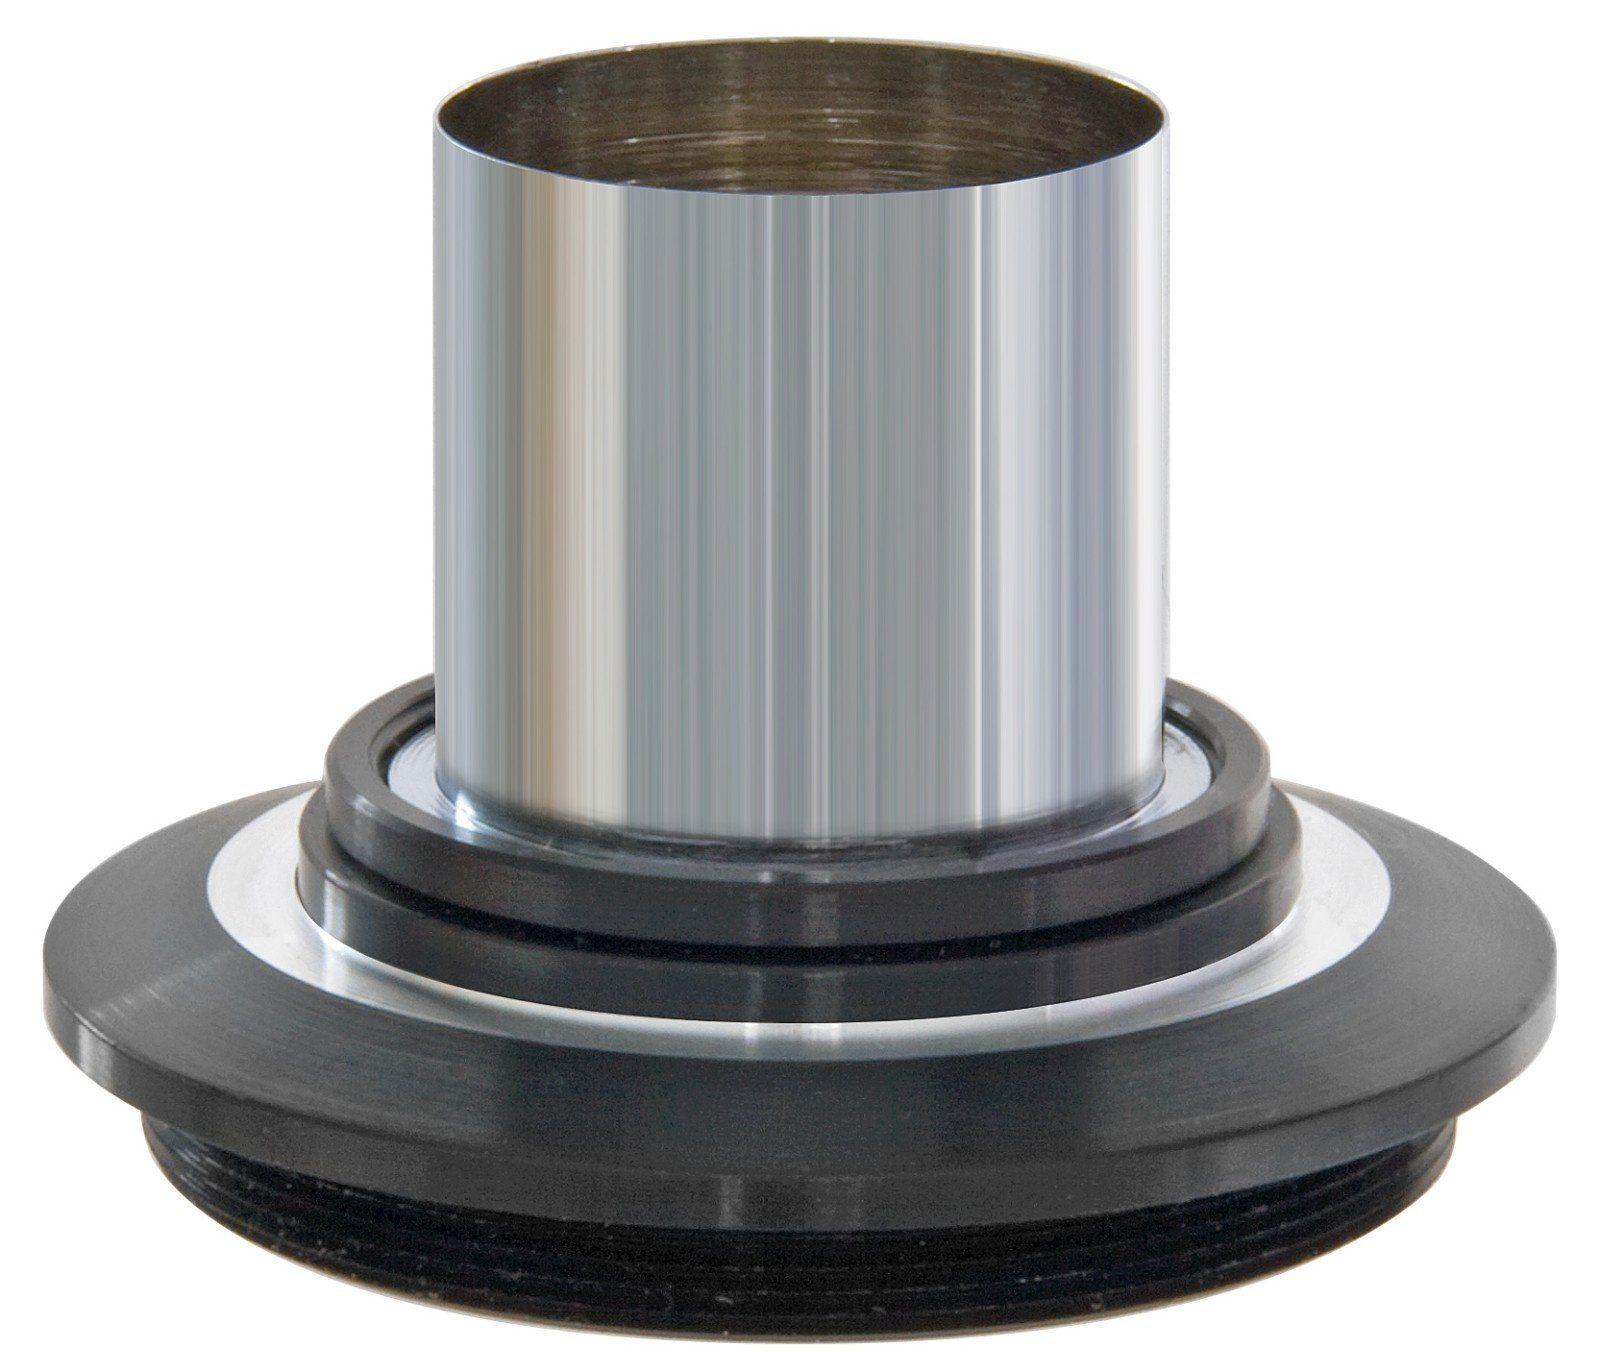 BRESSER Mikroskop »BRESSER Mikroskop-Kamera-Adapter 23mm«